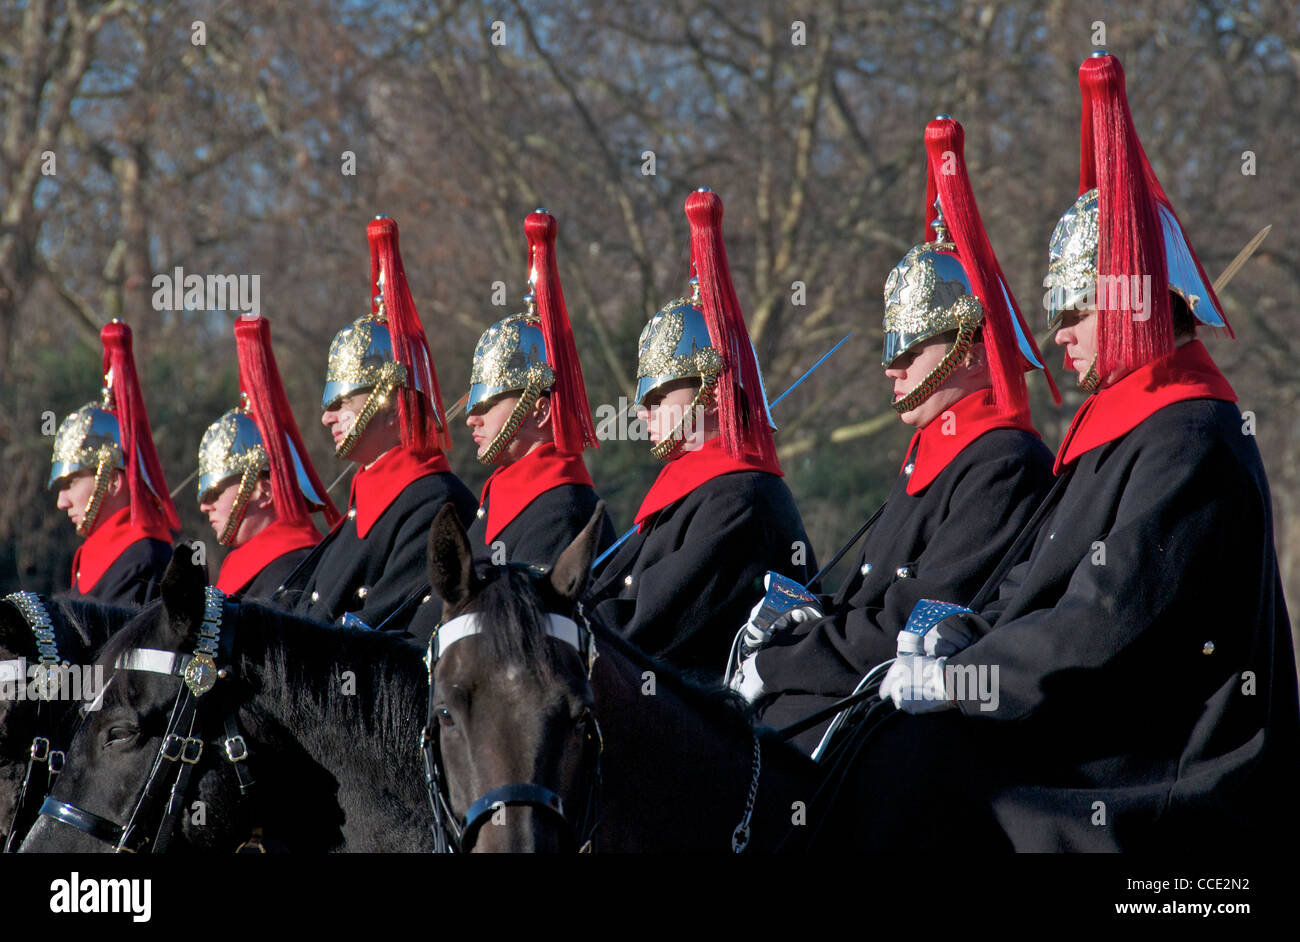 Close-up seven guardsmen on horseback Horse Guards Parade London England - Stock Image